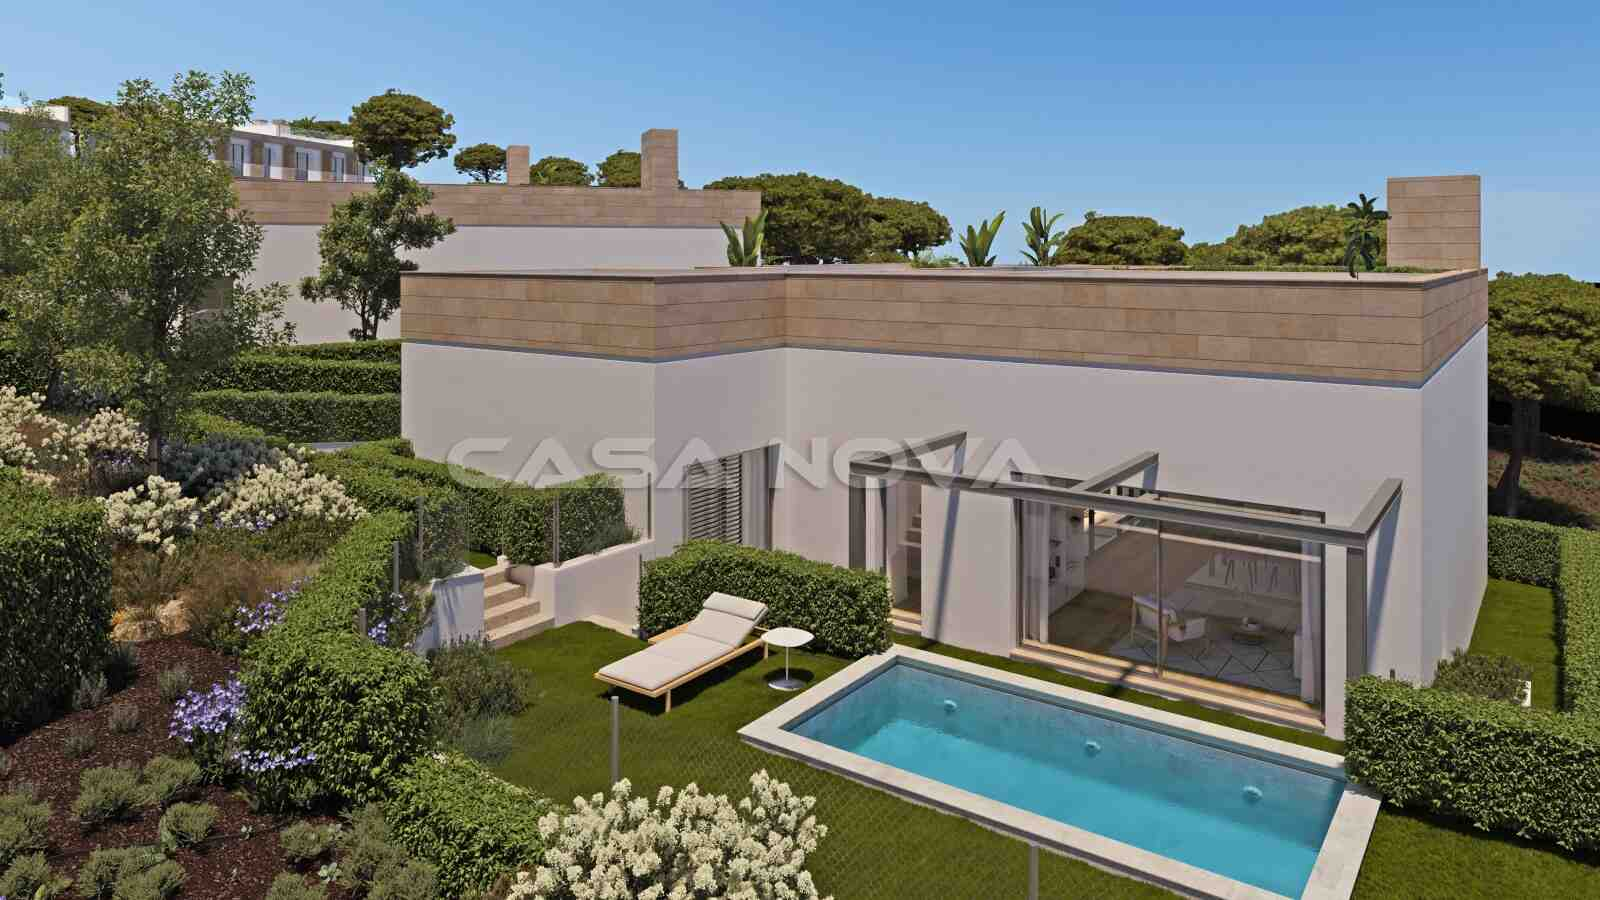 Moderne Neubauvilla mit Pool in ruhiger Lage